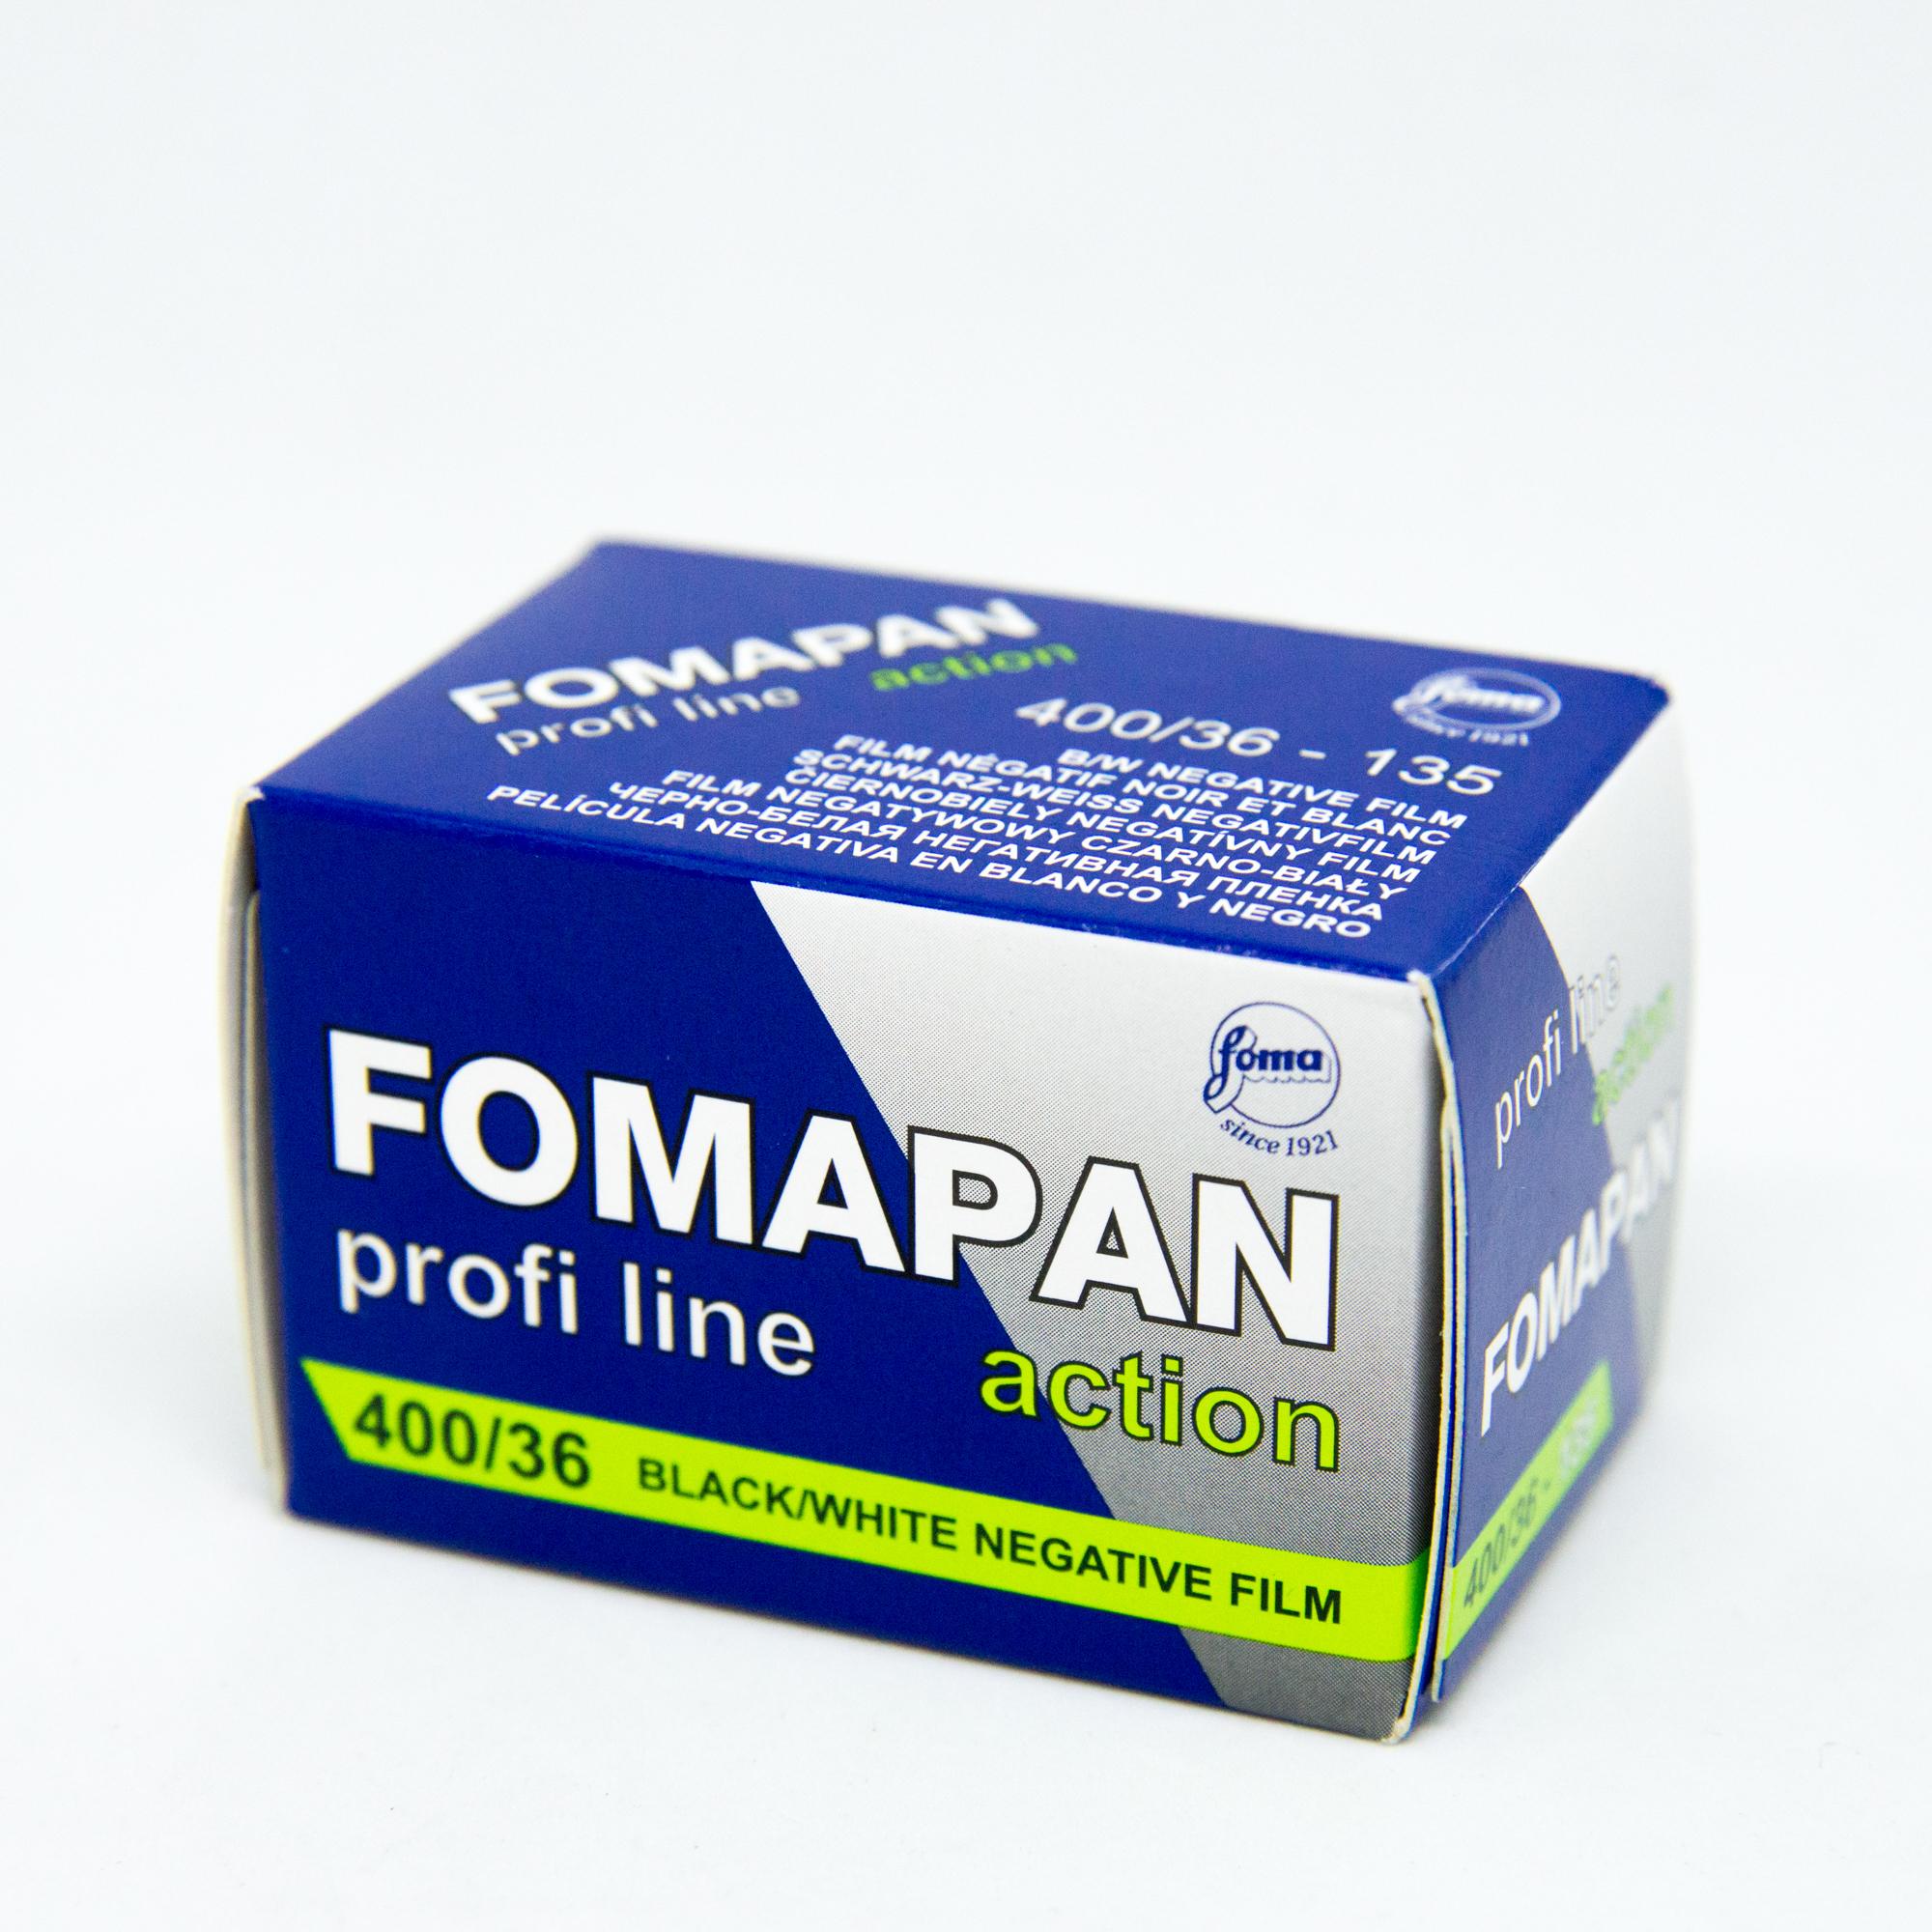 Фотопленка Foma Fomapan 400 Action /135-36